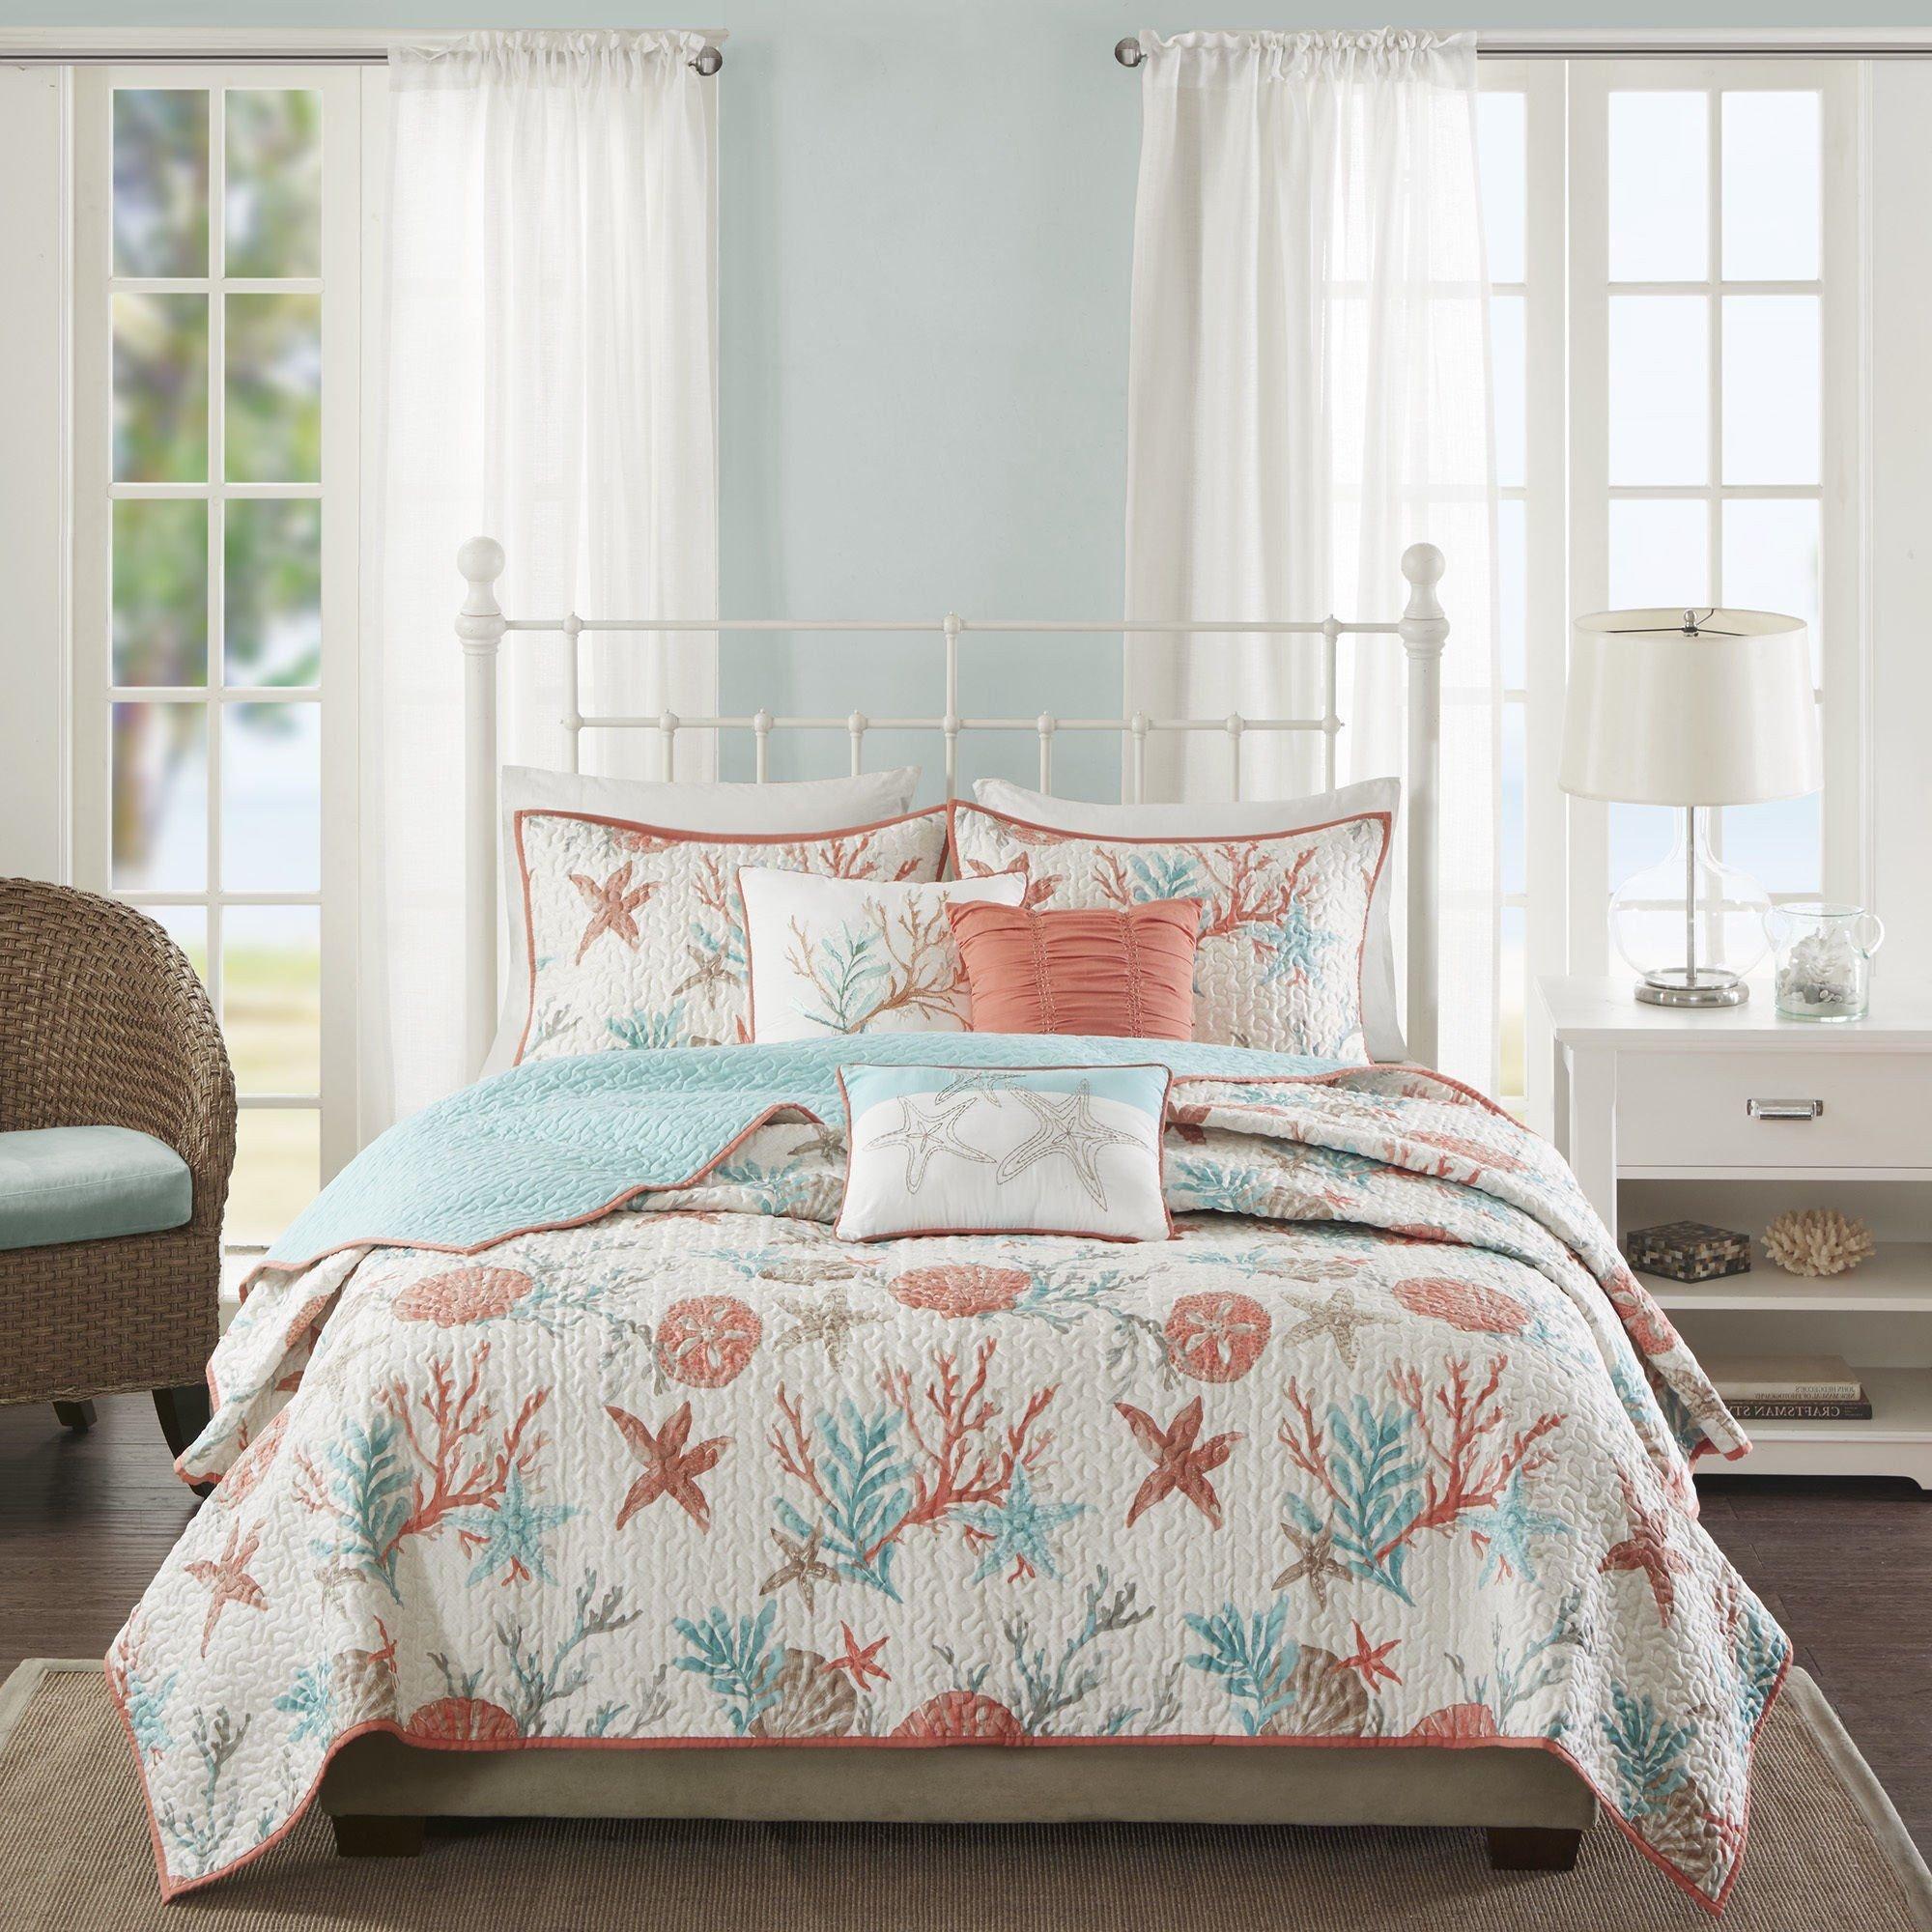 Beach themed Bedroom Set Elegant 6 Piece Vibrant orange Pink Blue White Full Queen Quilt Set